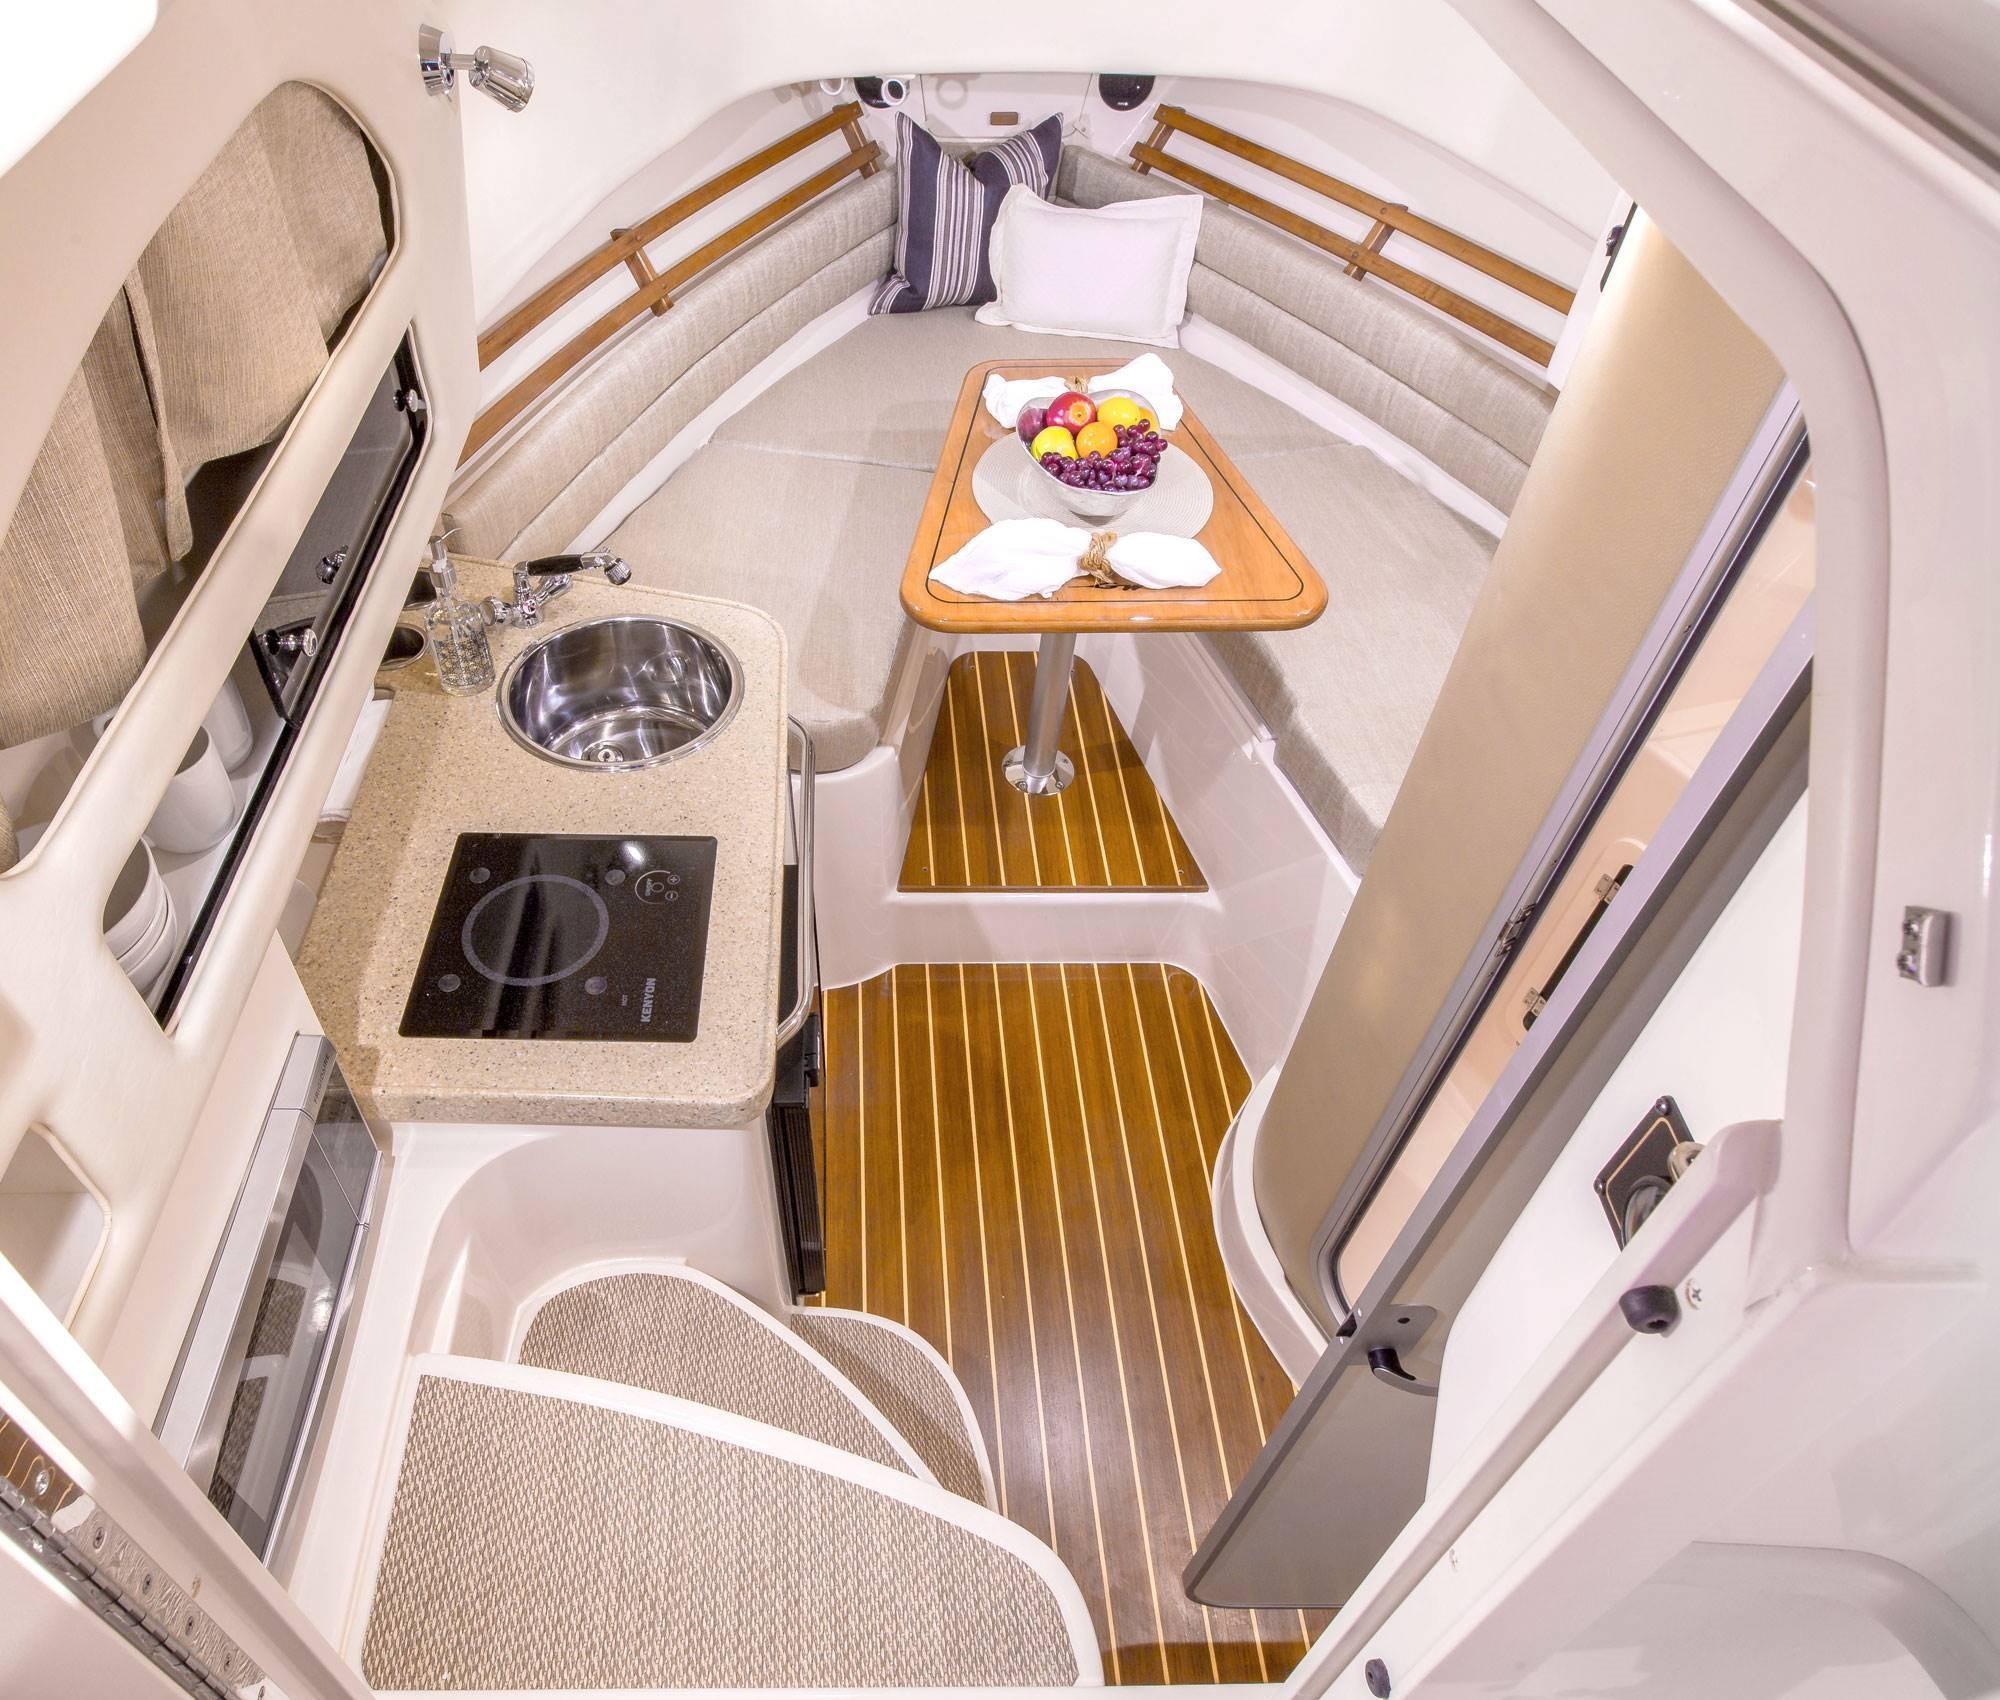 2021 Grady-White                                                              Marlin 300 Image Thumbnail #3